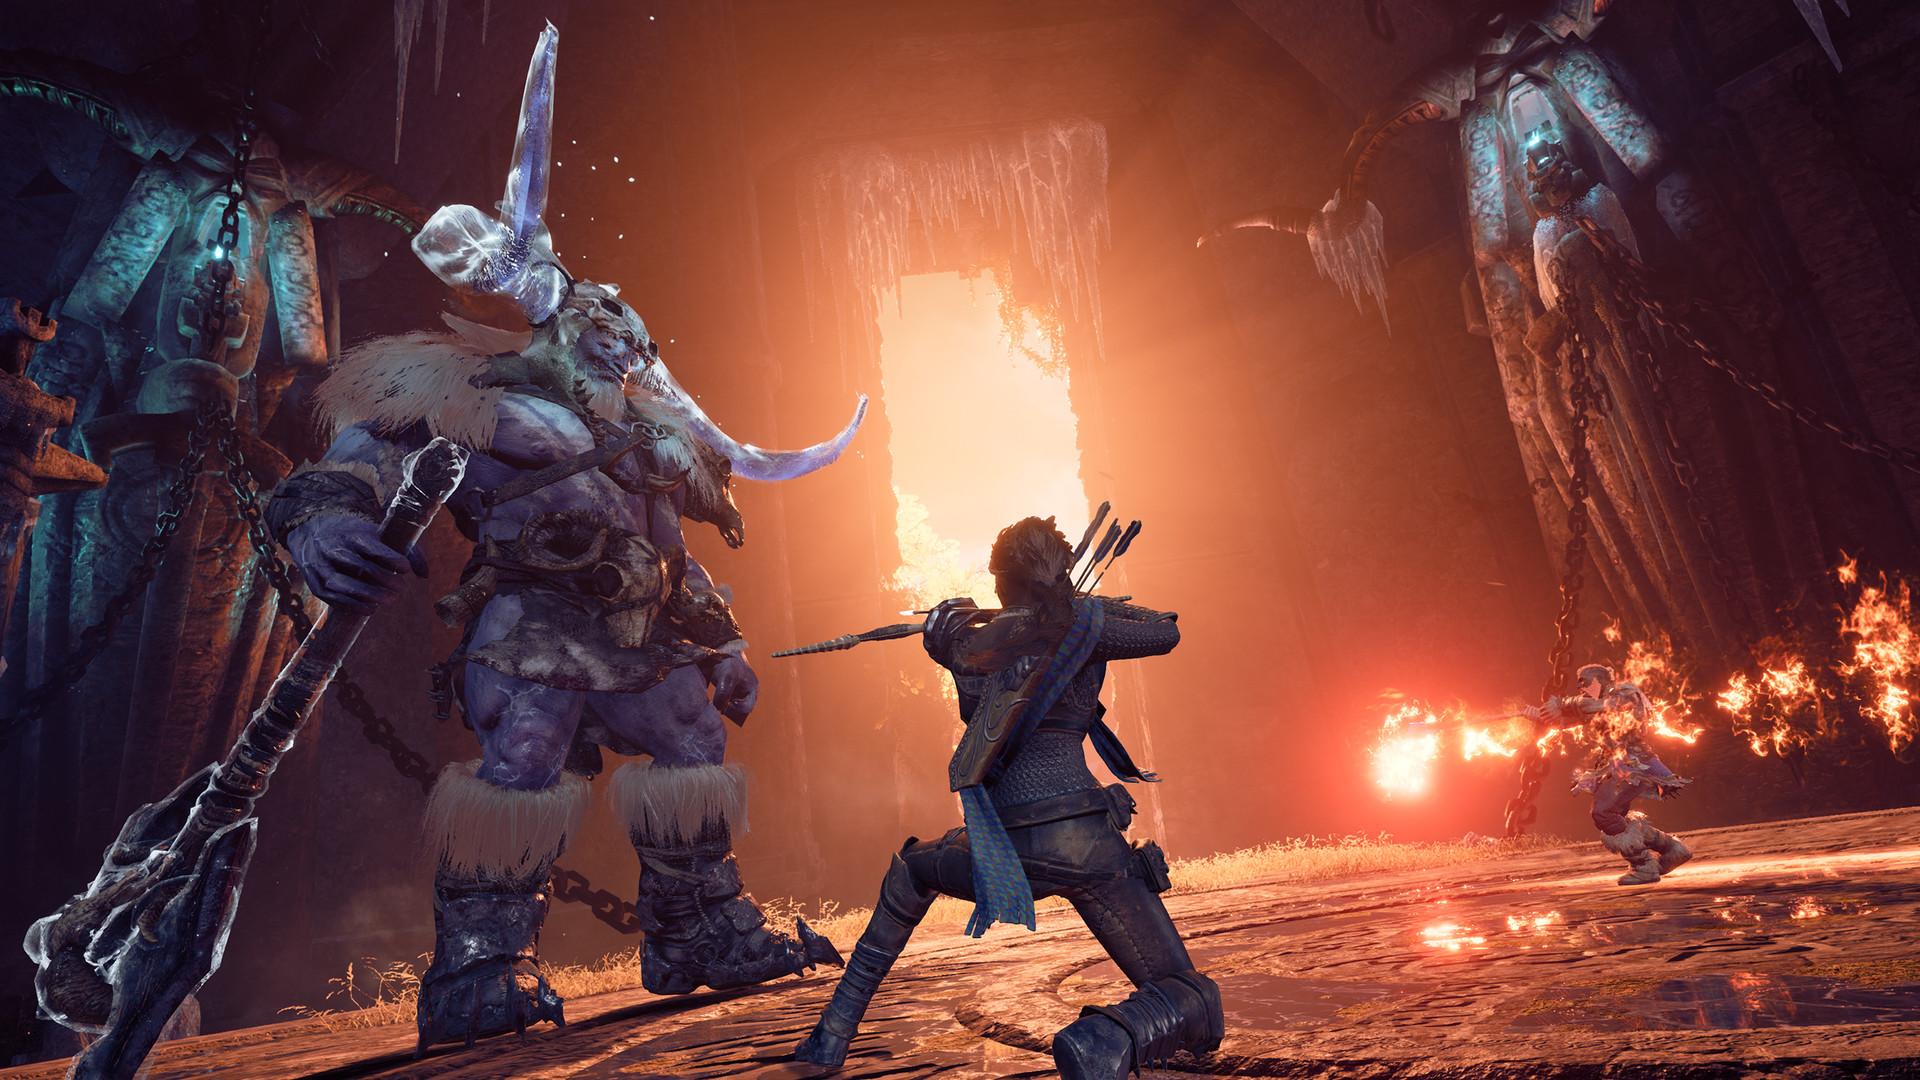 dungeons-and-dragons-dark-alliance-pc-screenshot-4